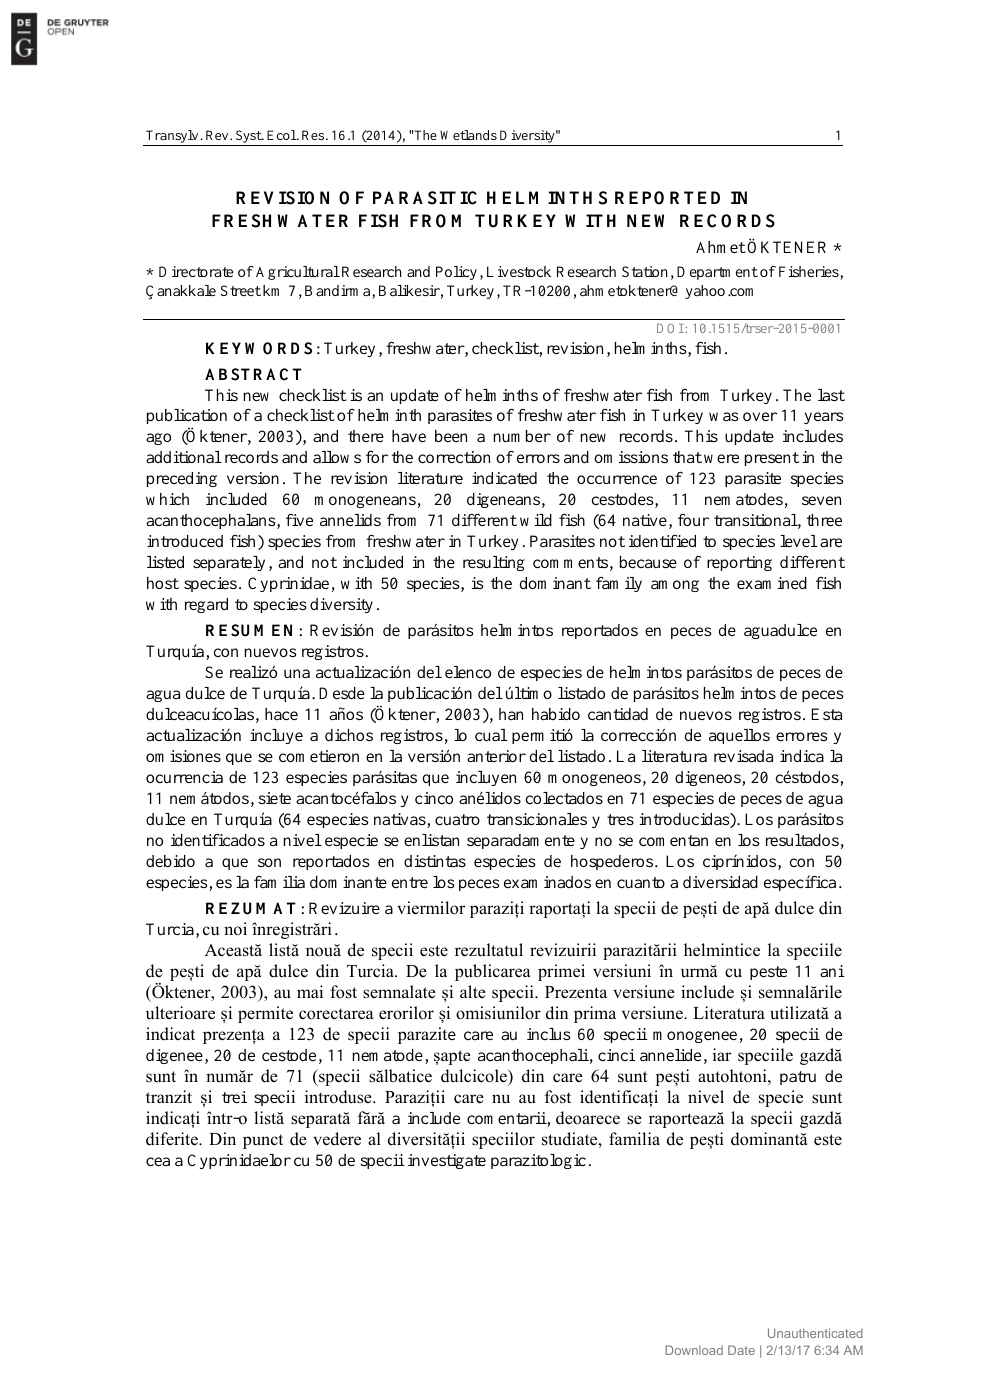 Cestode - Wikipedia